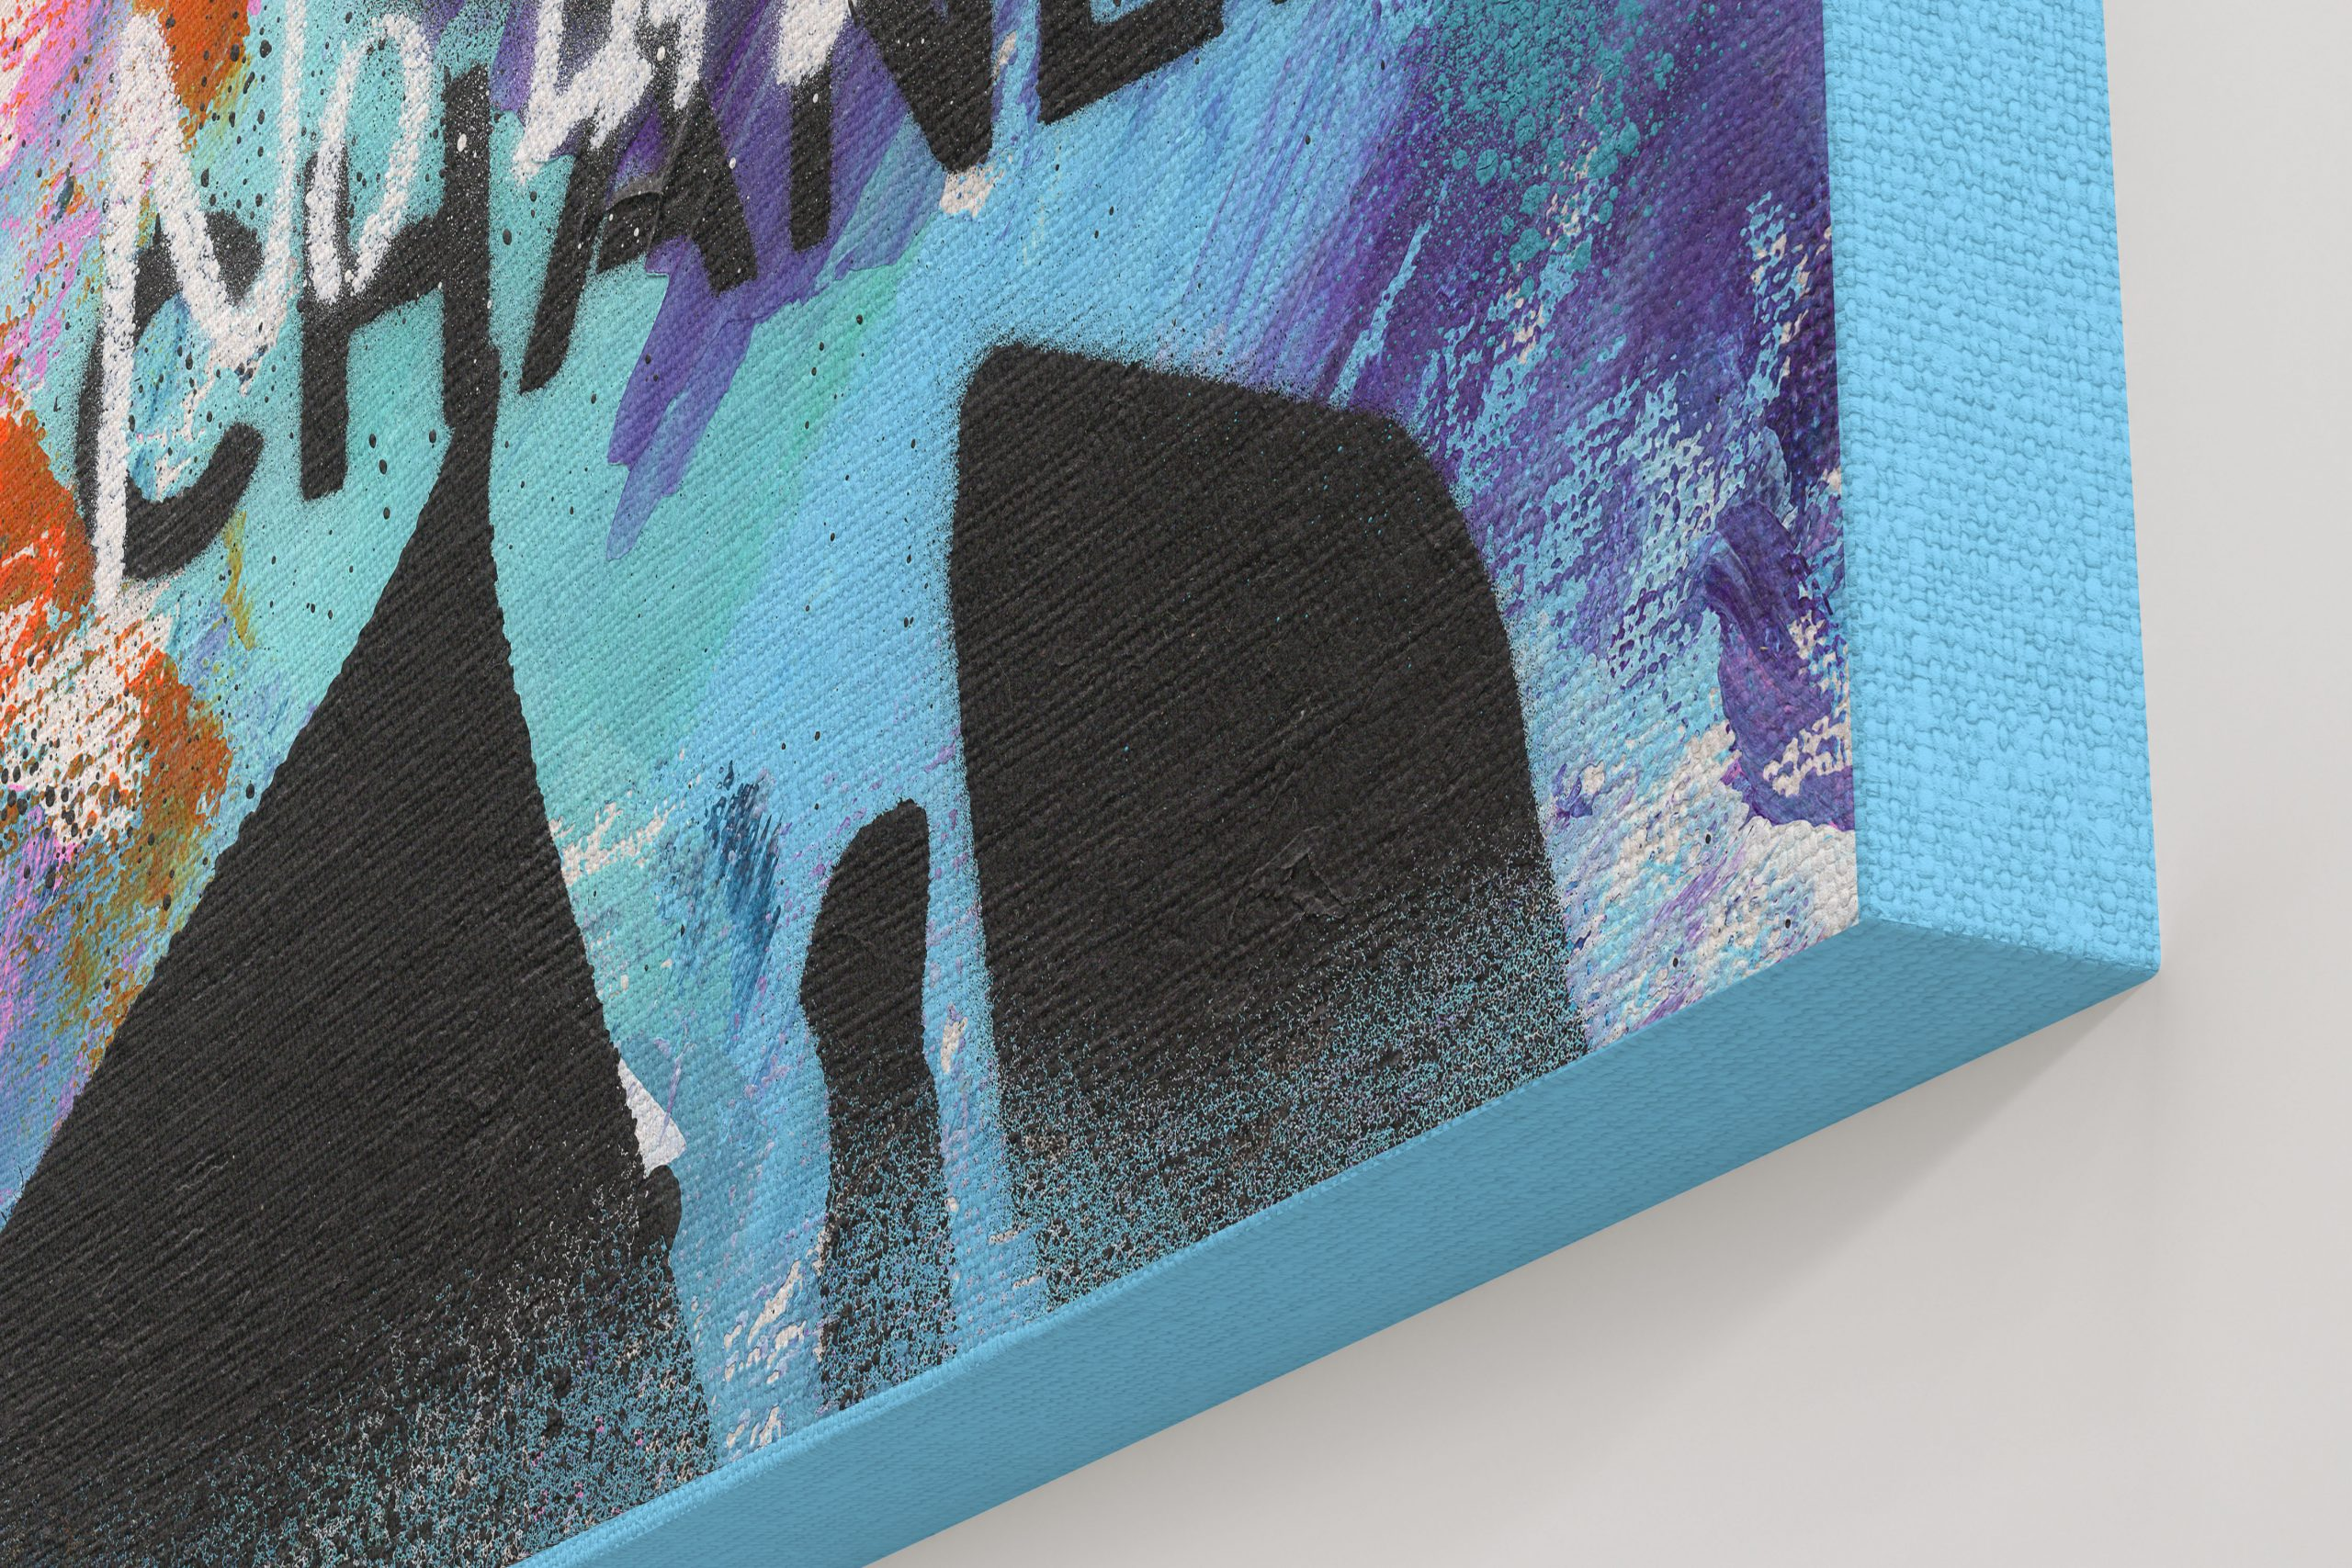 NATALIE-OTALORA-ART-NO-LIKES-NO-CHANEL-GRAFFITI-PAINTING-CLOSEUP.JPG